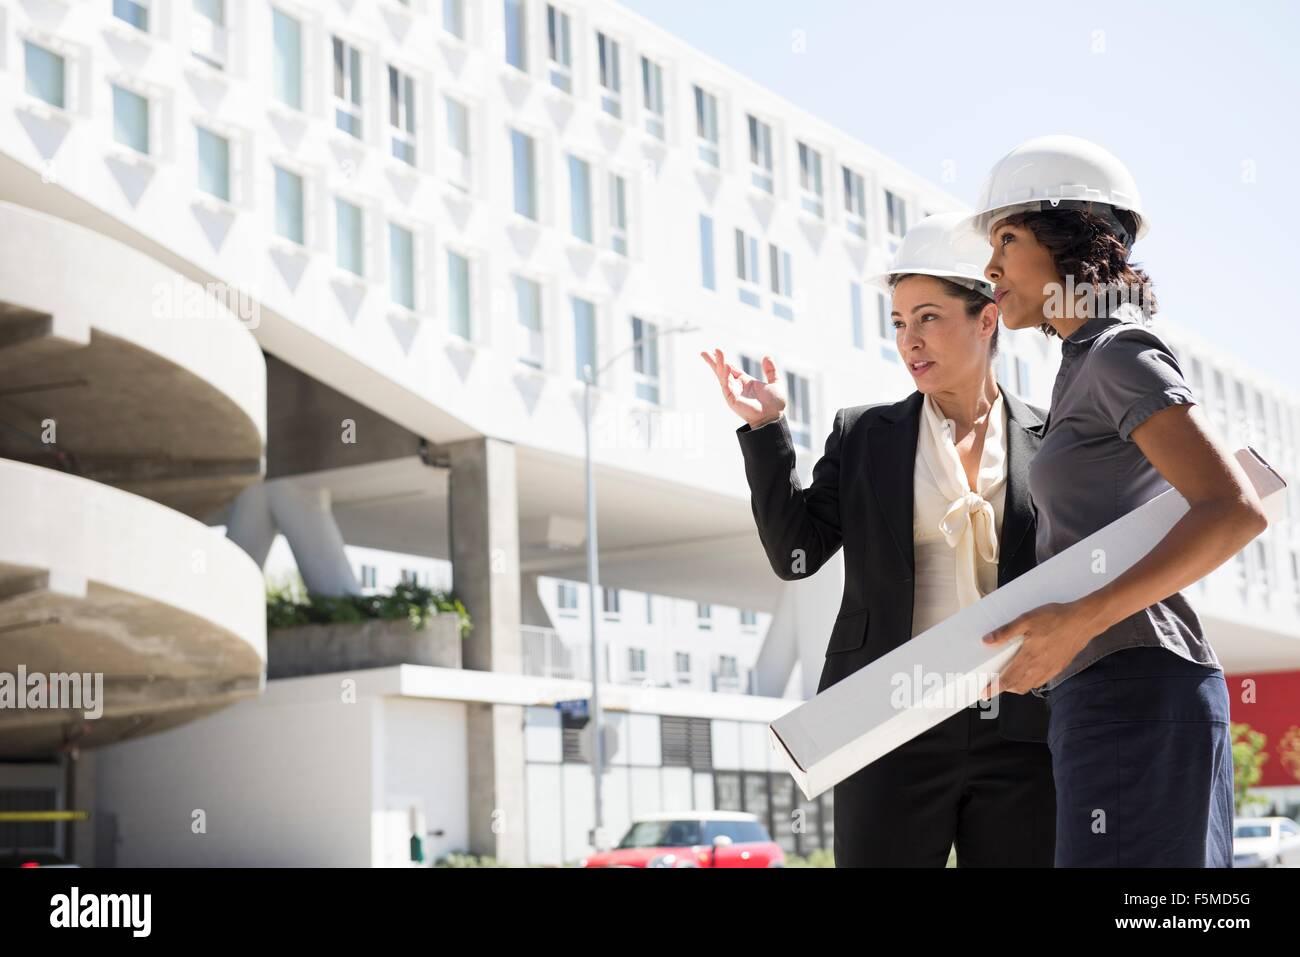 Dos mujeres empresarias, portando cascos, planes de transporte Imagen De Stock